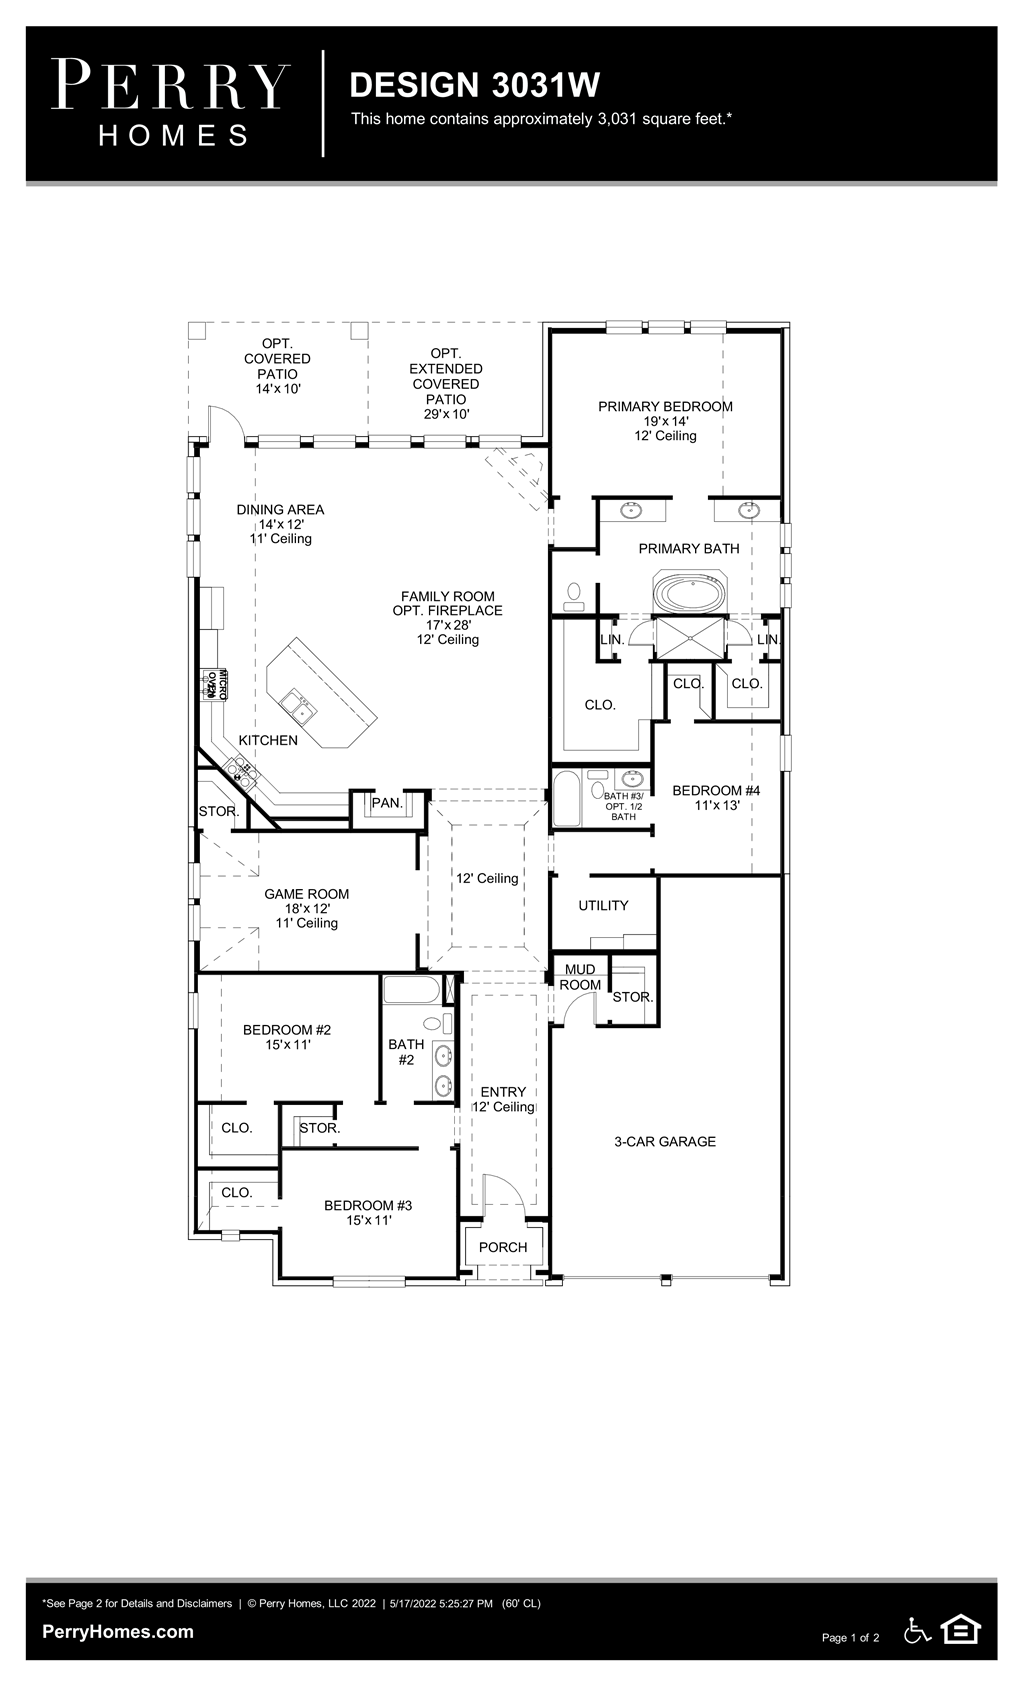 Floor Plan for 3031W